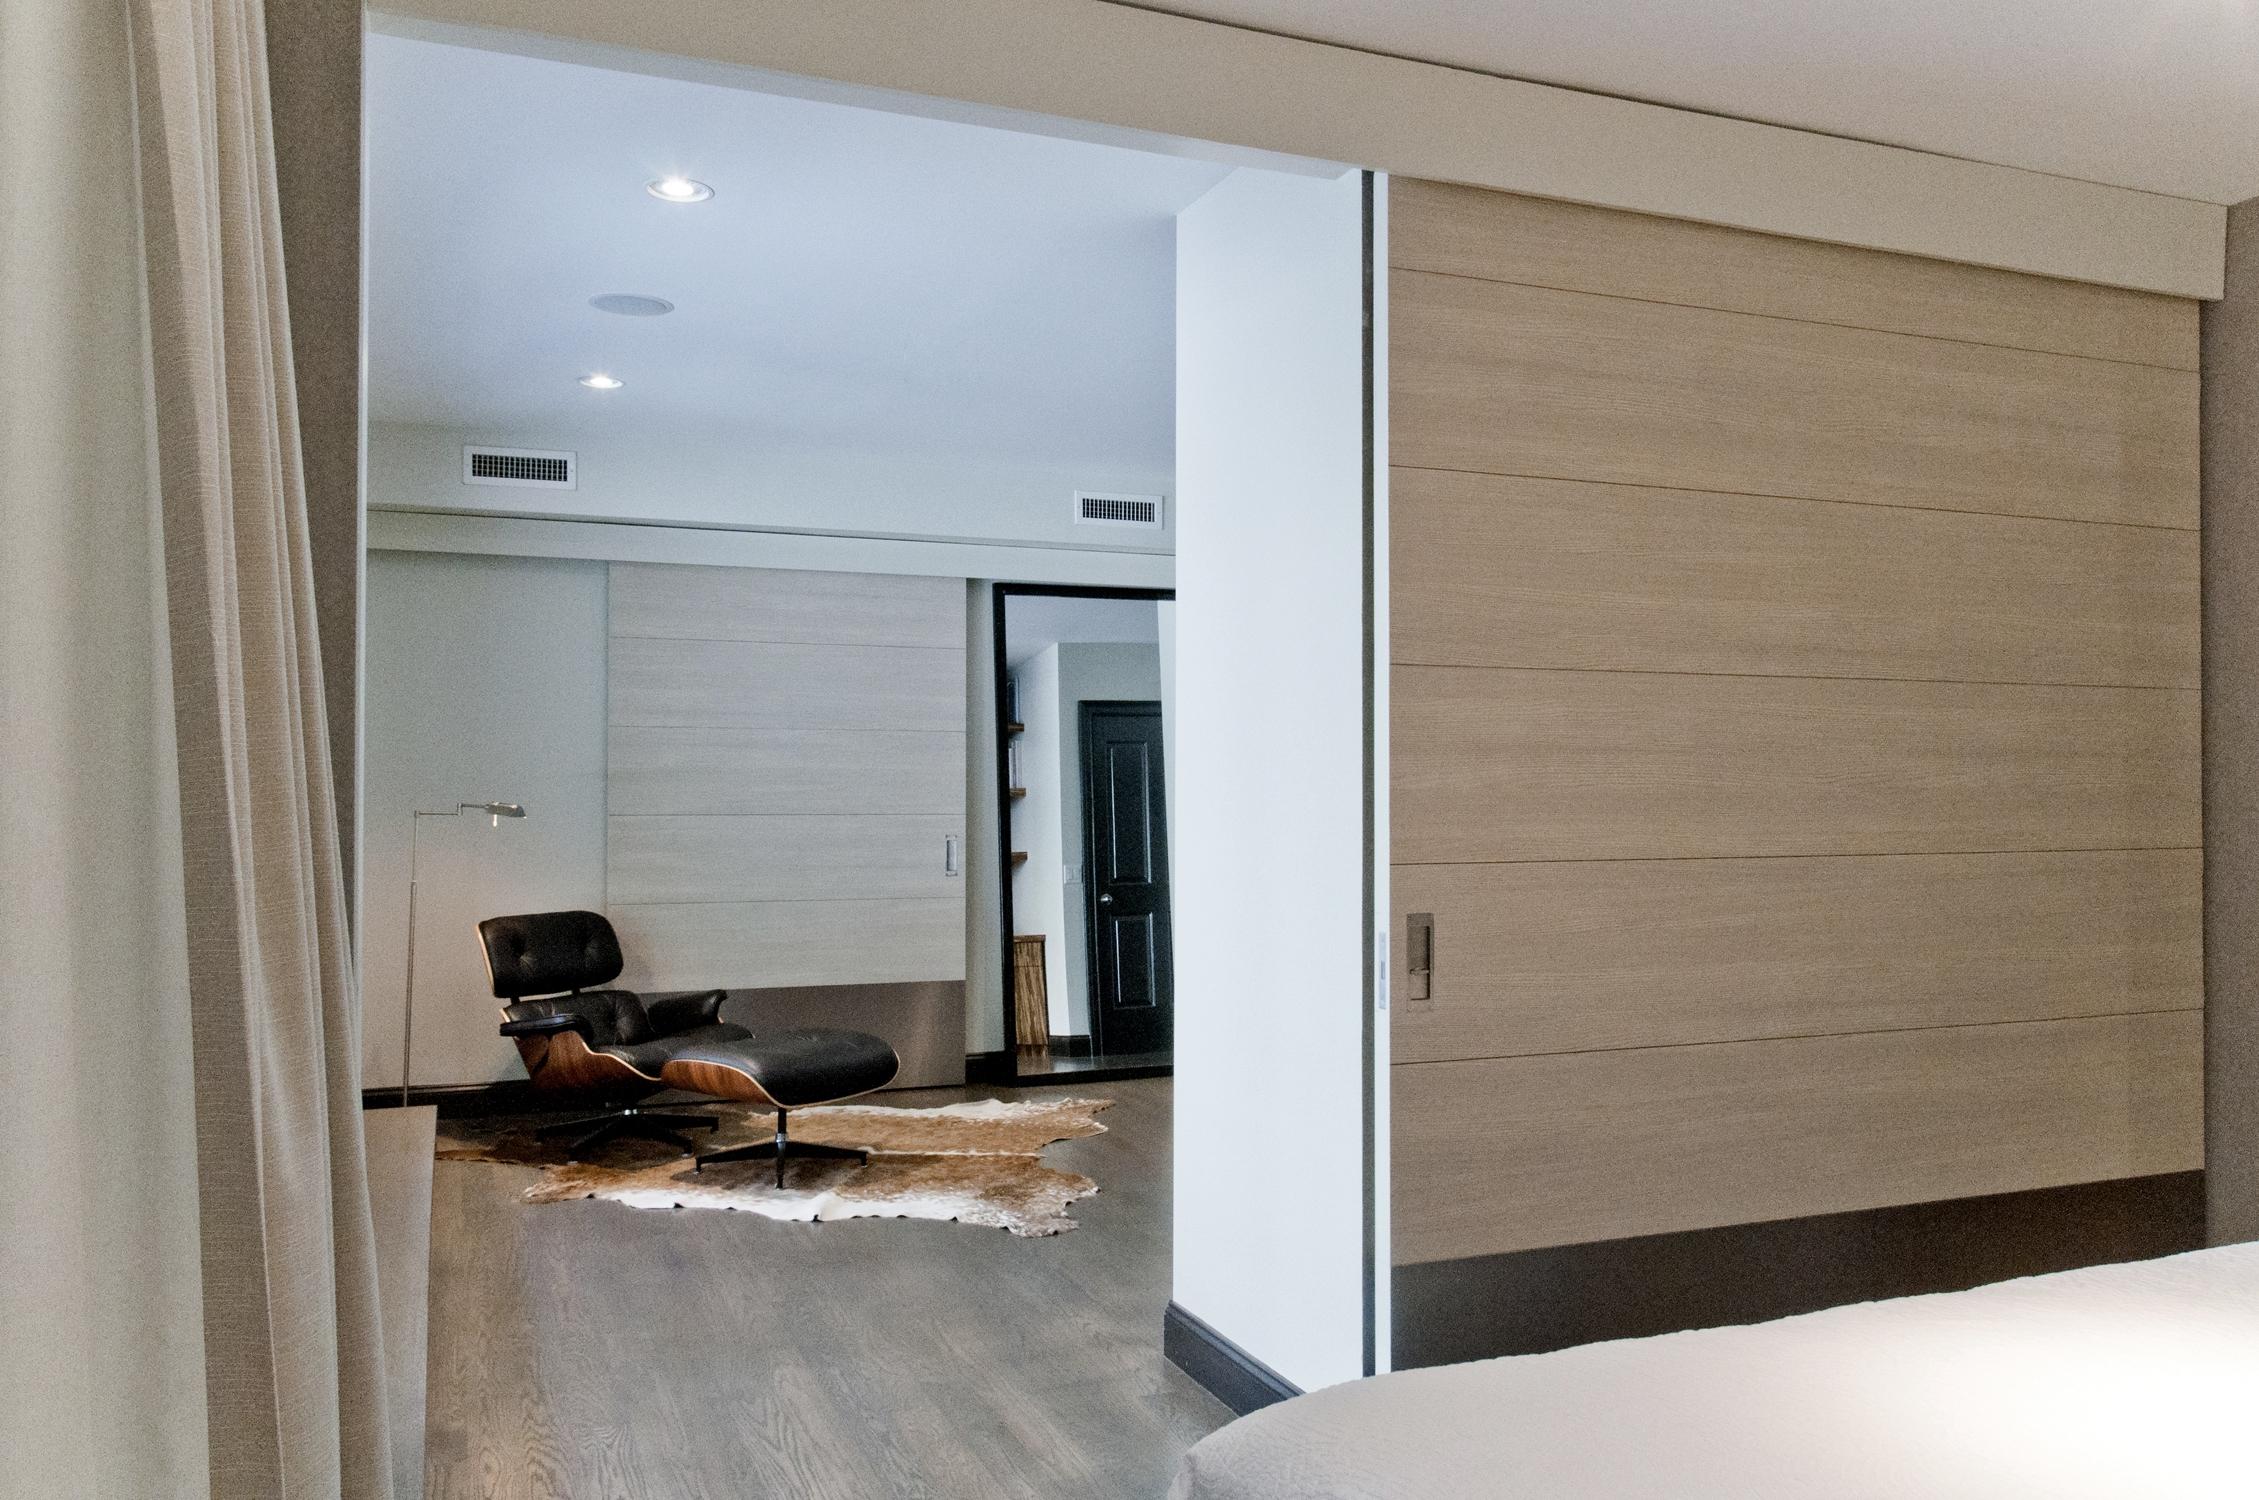 Triple Panel Sliding Door Hardwarelarge oversize sliding doors non warping patented honeycomb